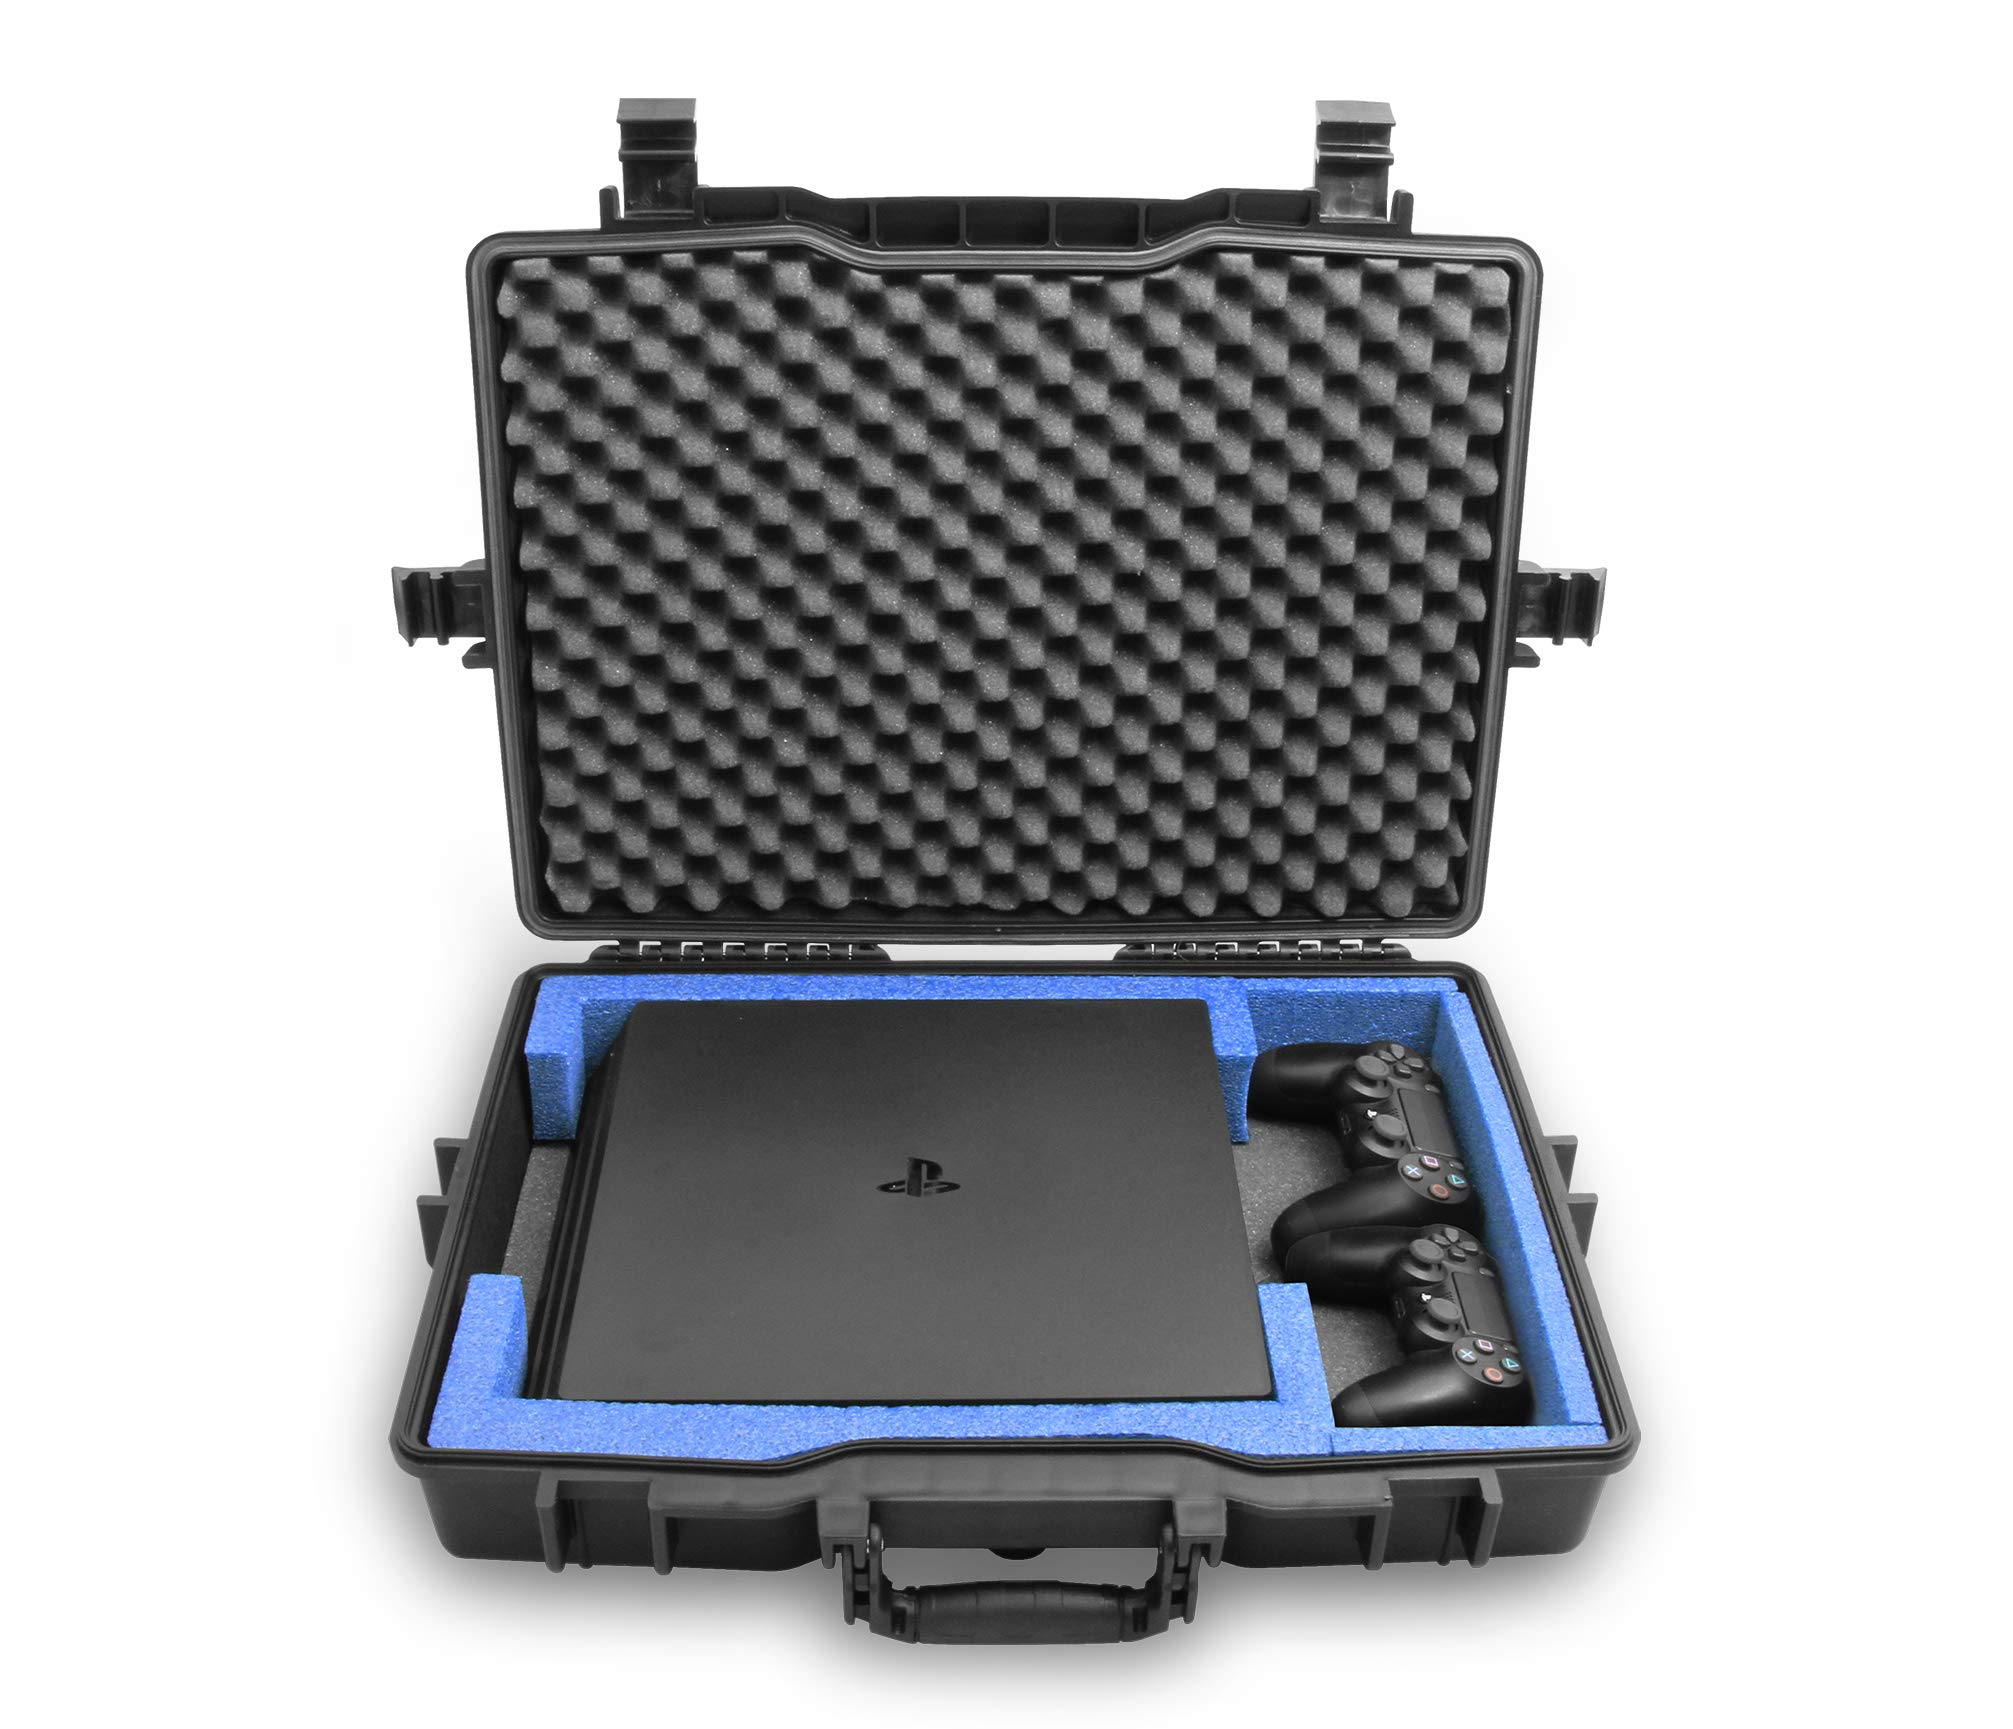 Estuche de transporte PS4 impermeable Casematix Compatible con la consola Playstation 4 Pro de 1 TB, controladores y cables de doble choque PS4 pro, incluye solo estuche